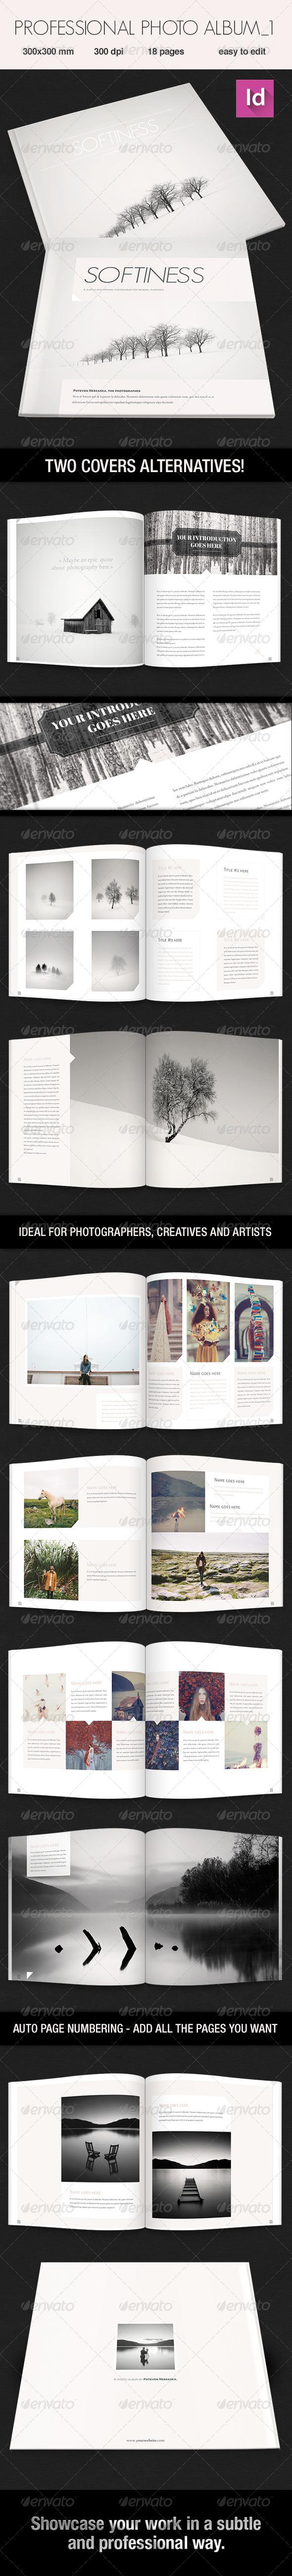 GraphicRiver Photo Album 1 6382916